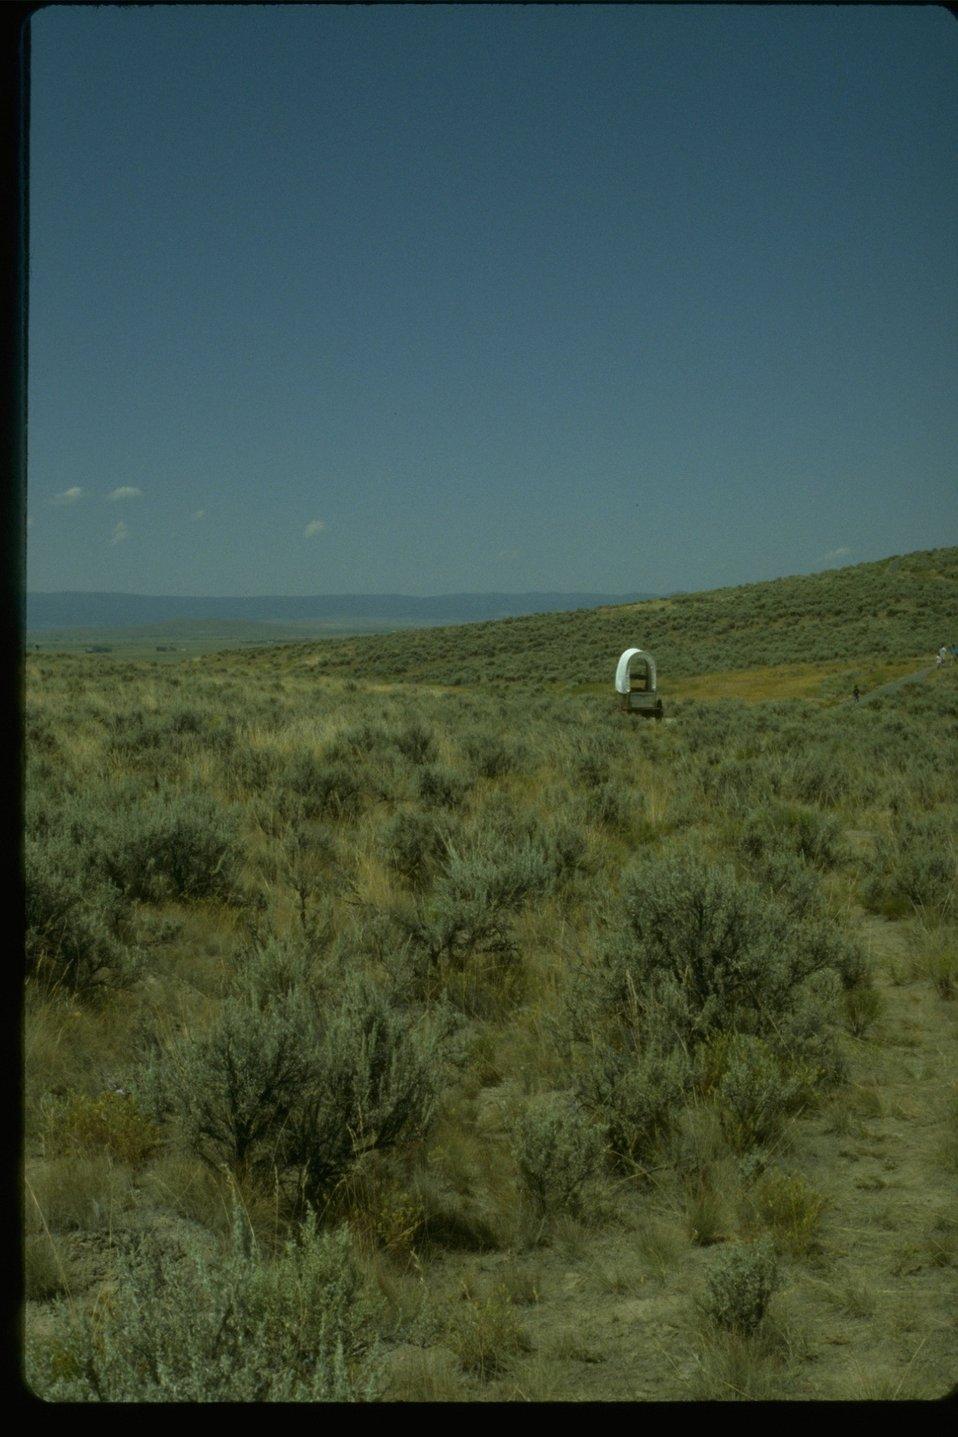 Flagstaff hill ruts near the NHOTIC.